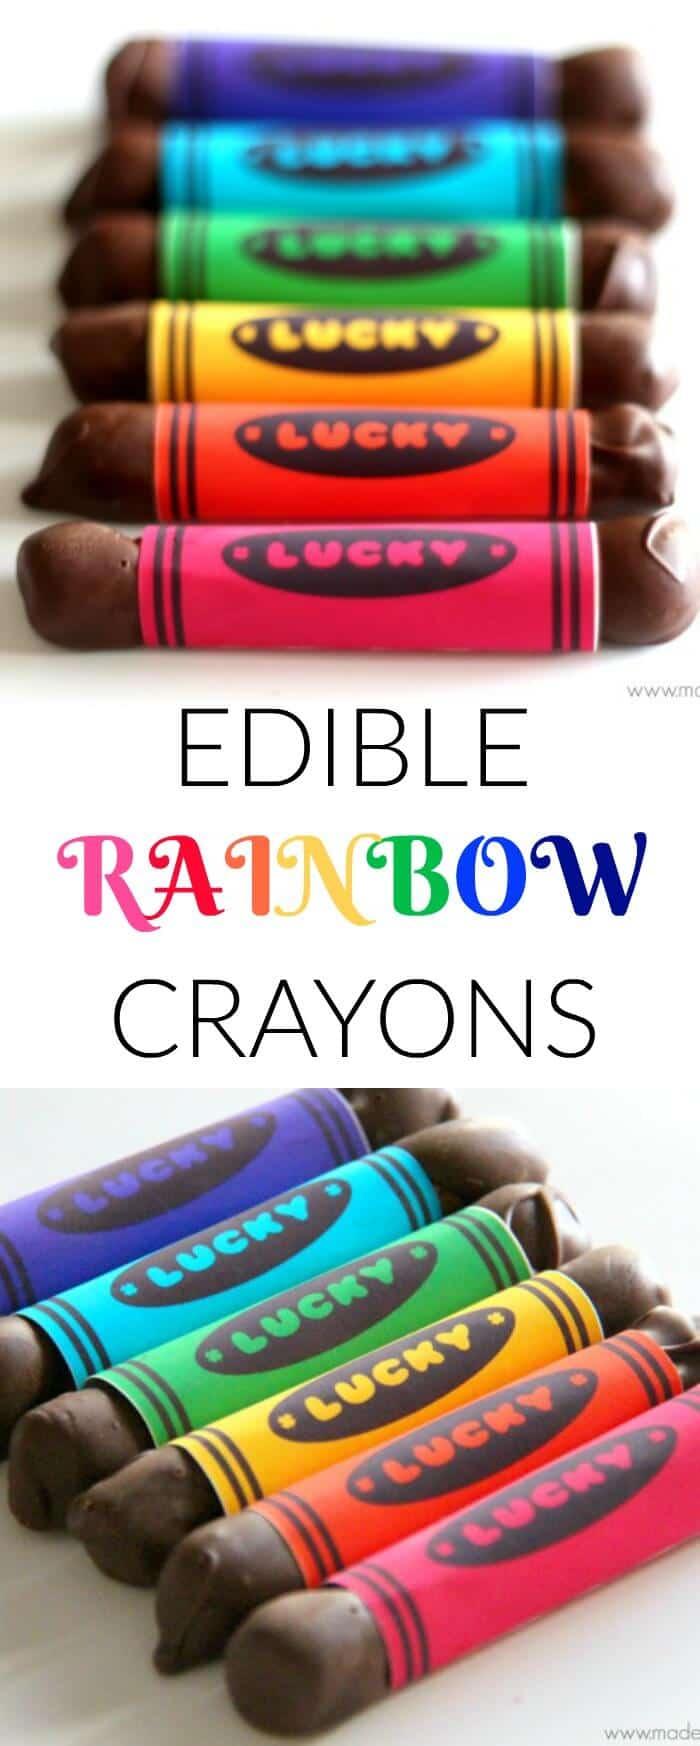 Edible Rainbow Crayons